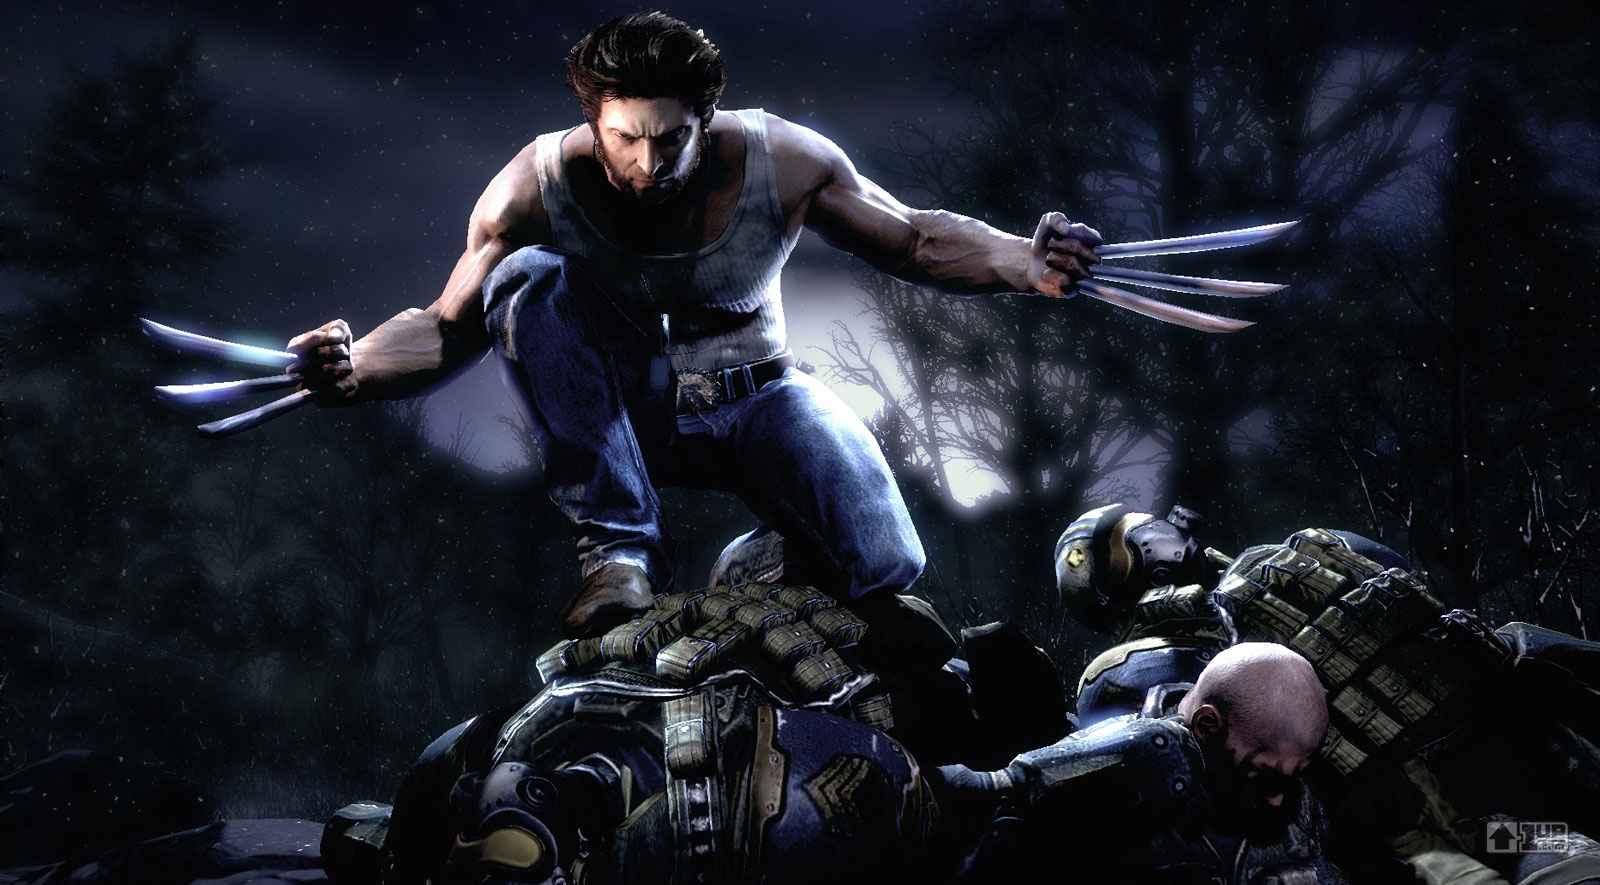 X Men Origins Wolverine Game Wallpapers 1600x885